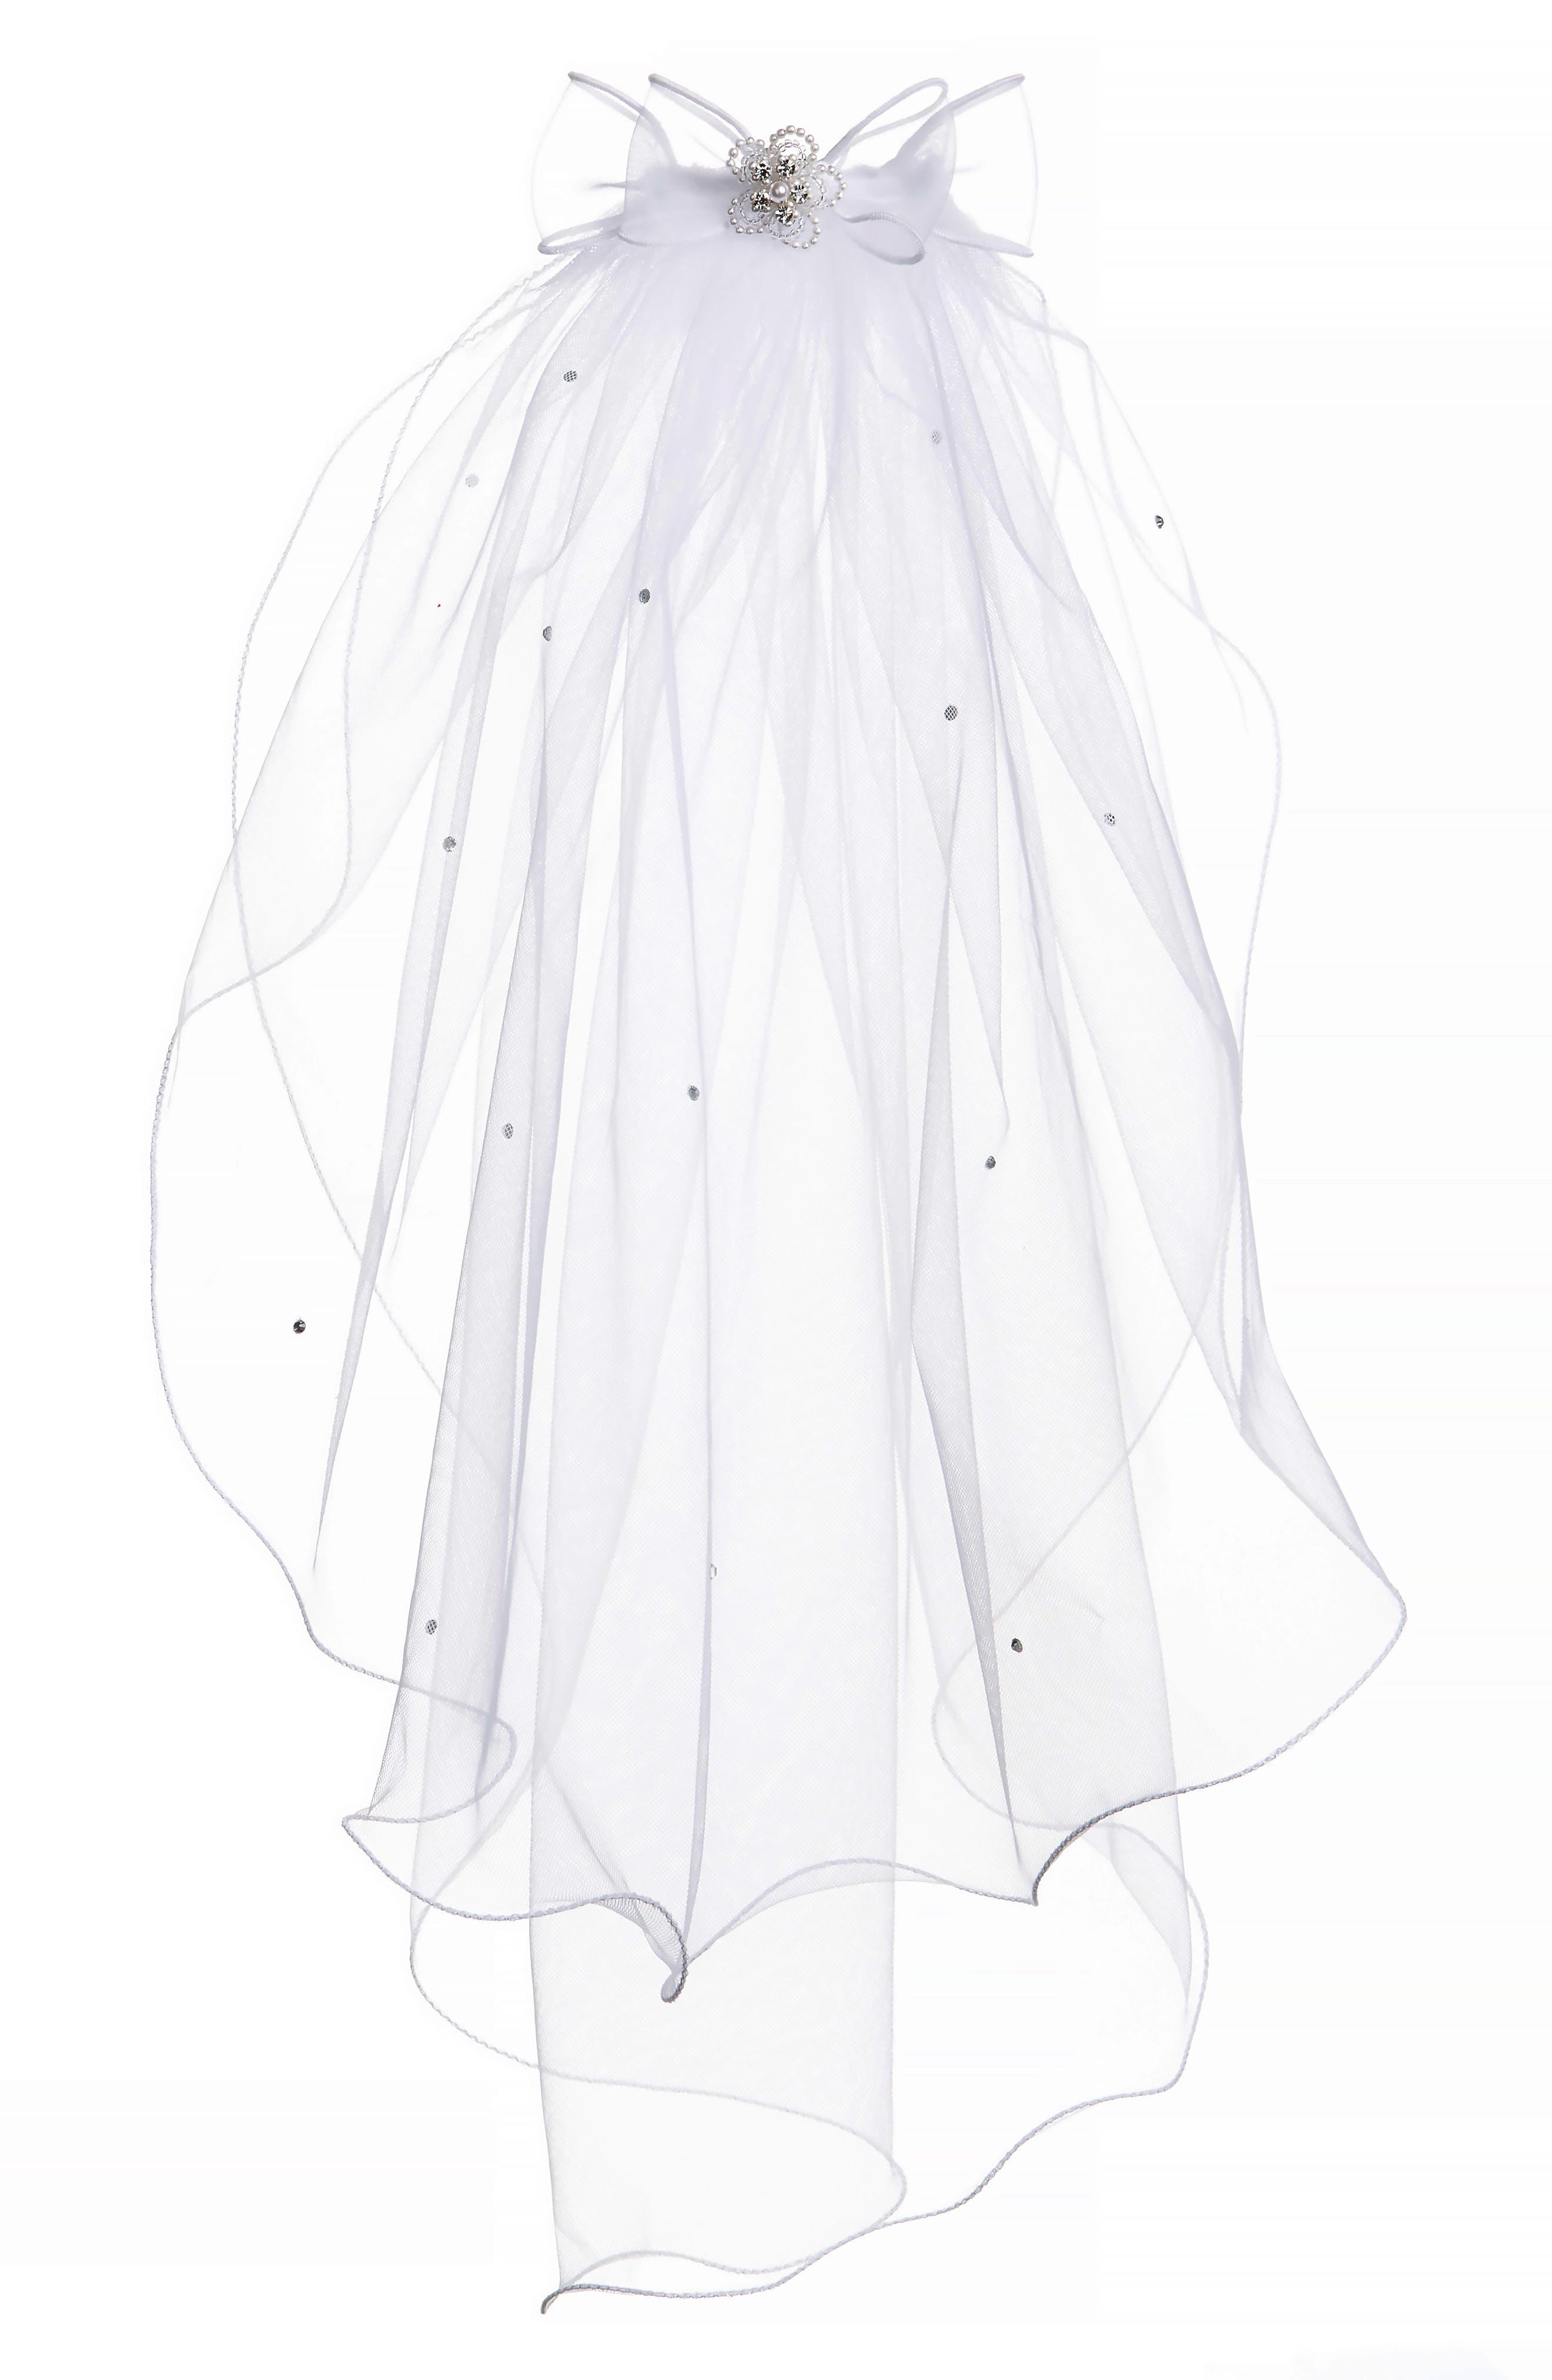 Beaded Bow & Veil,                         Main,                         color, White